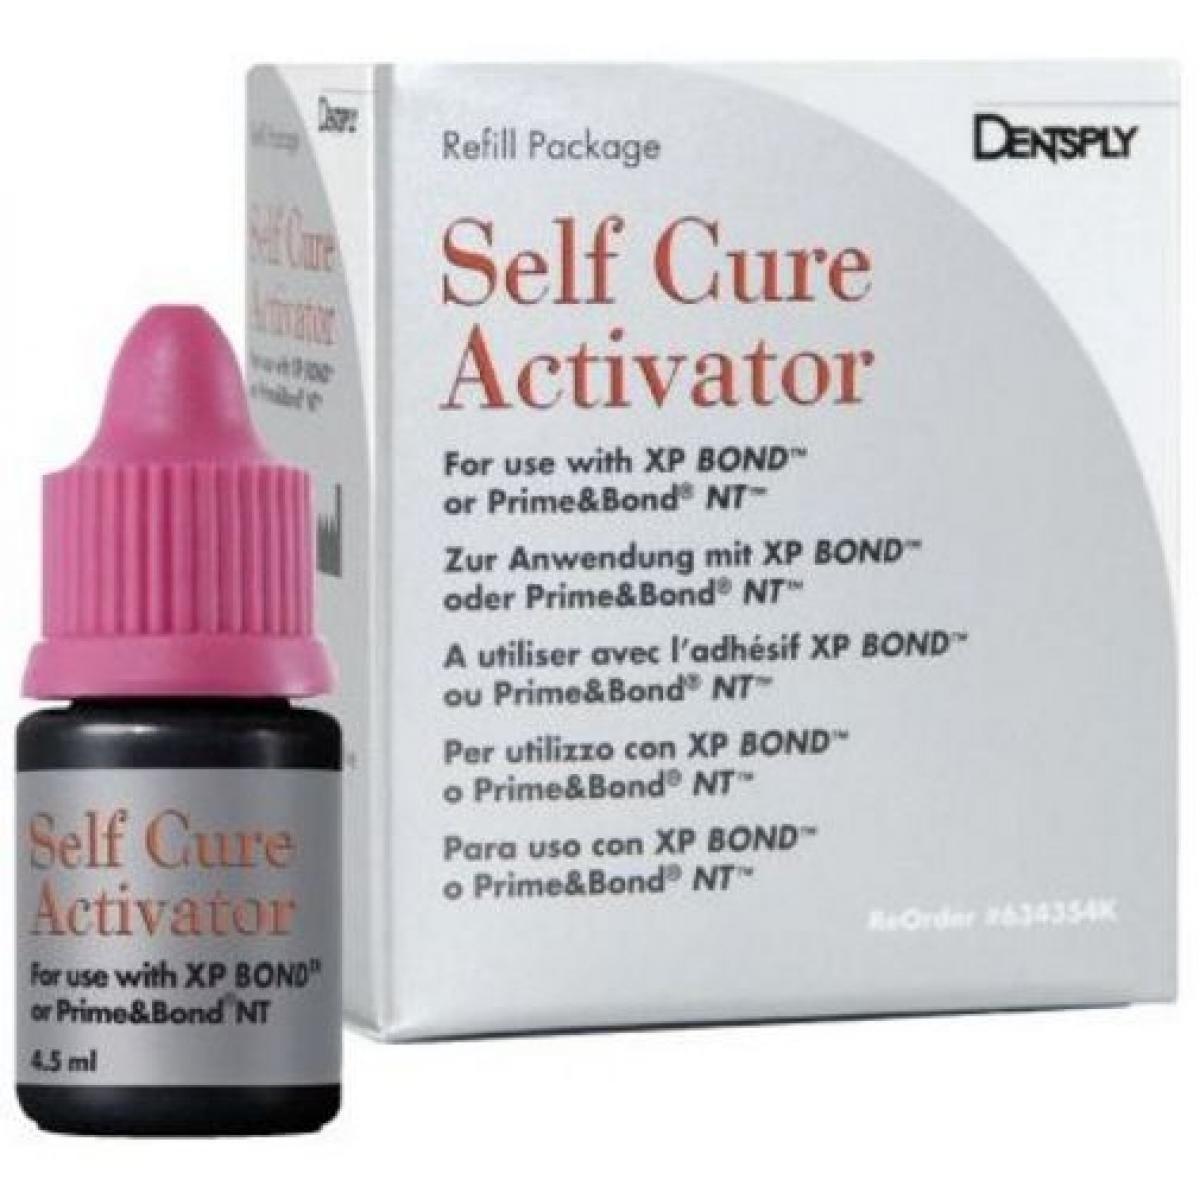 SELF CURE ACTIVADOR 4 5 ML -